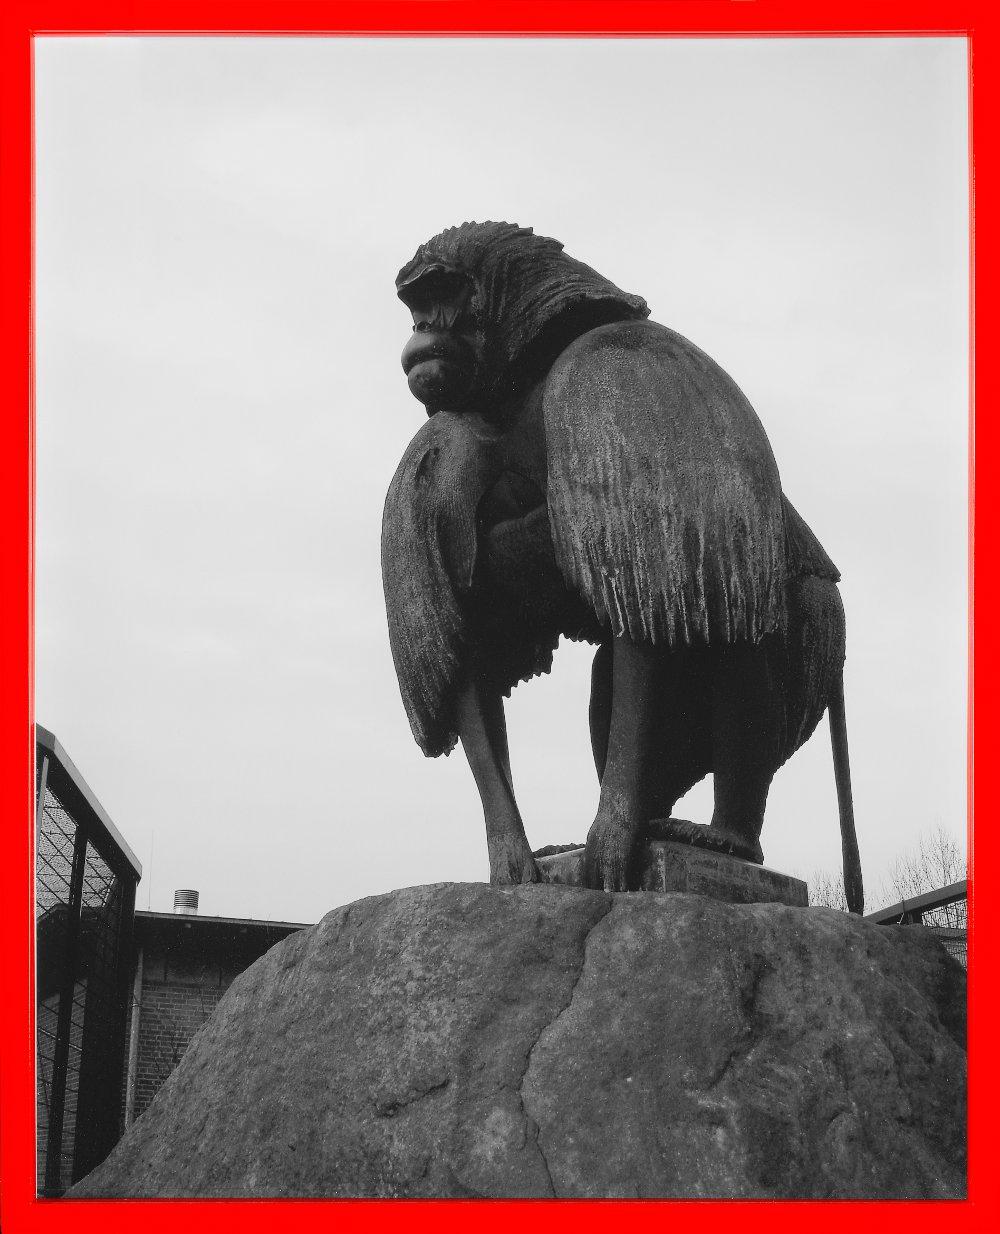 swetlana-heger-animal-farm-2007